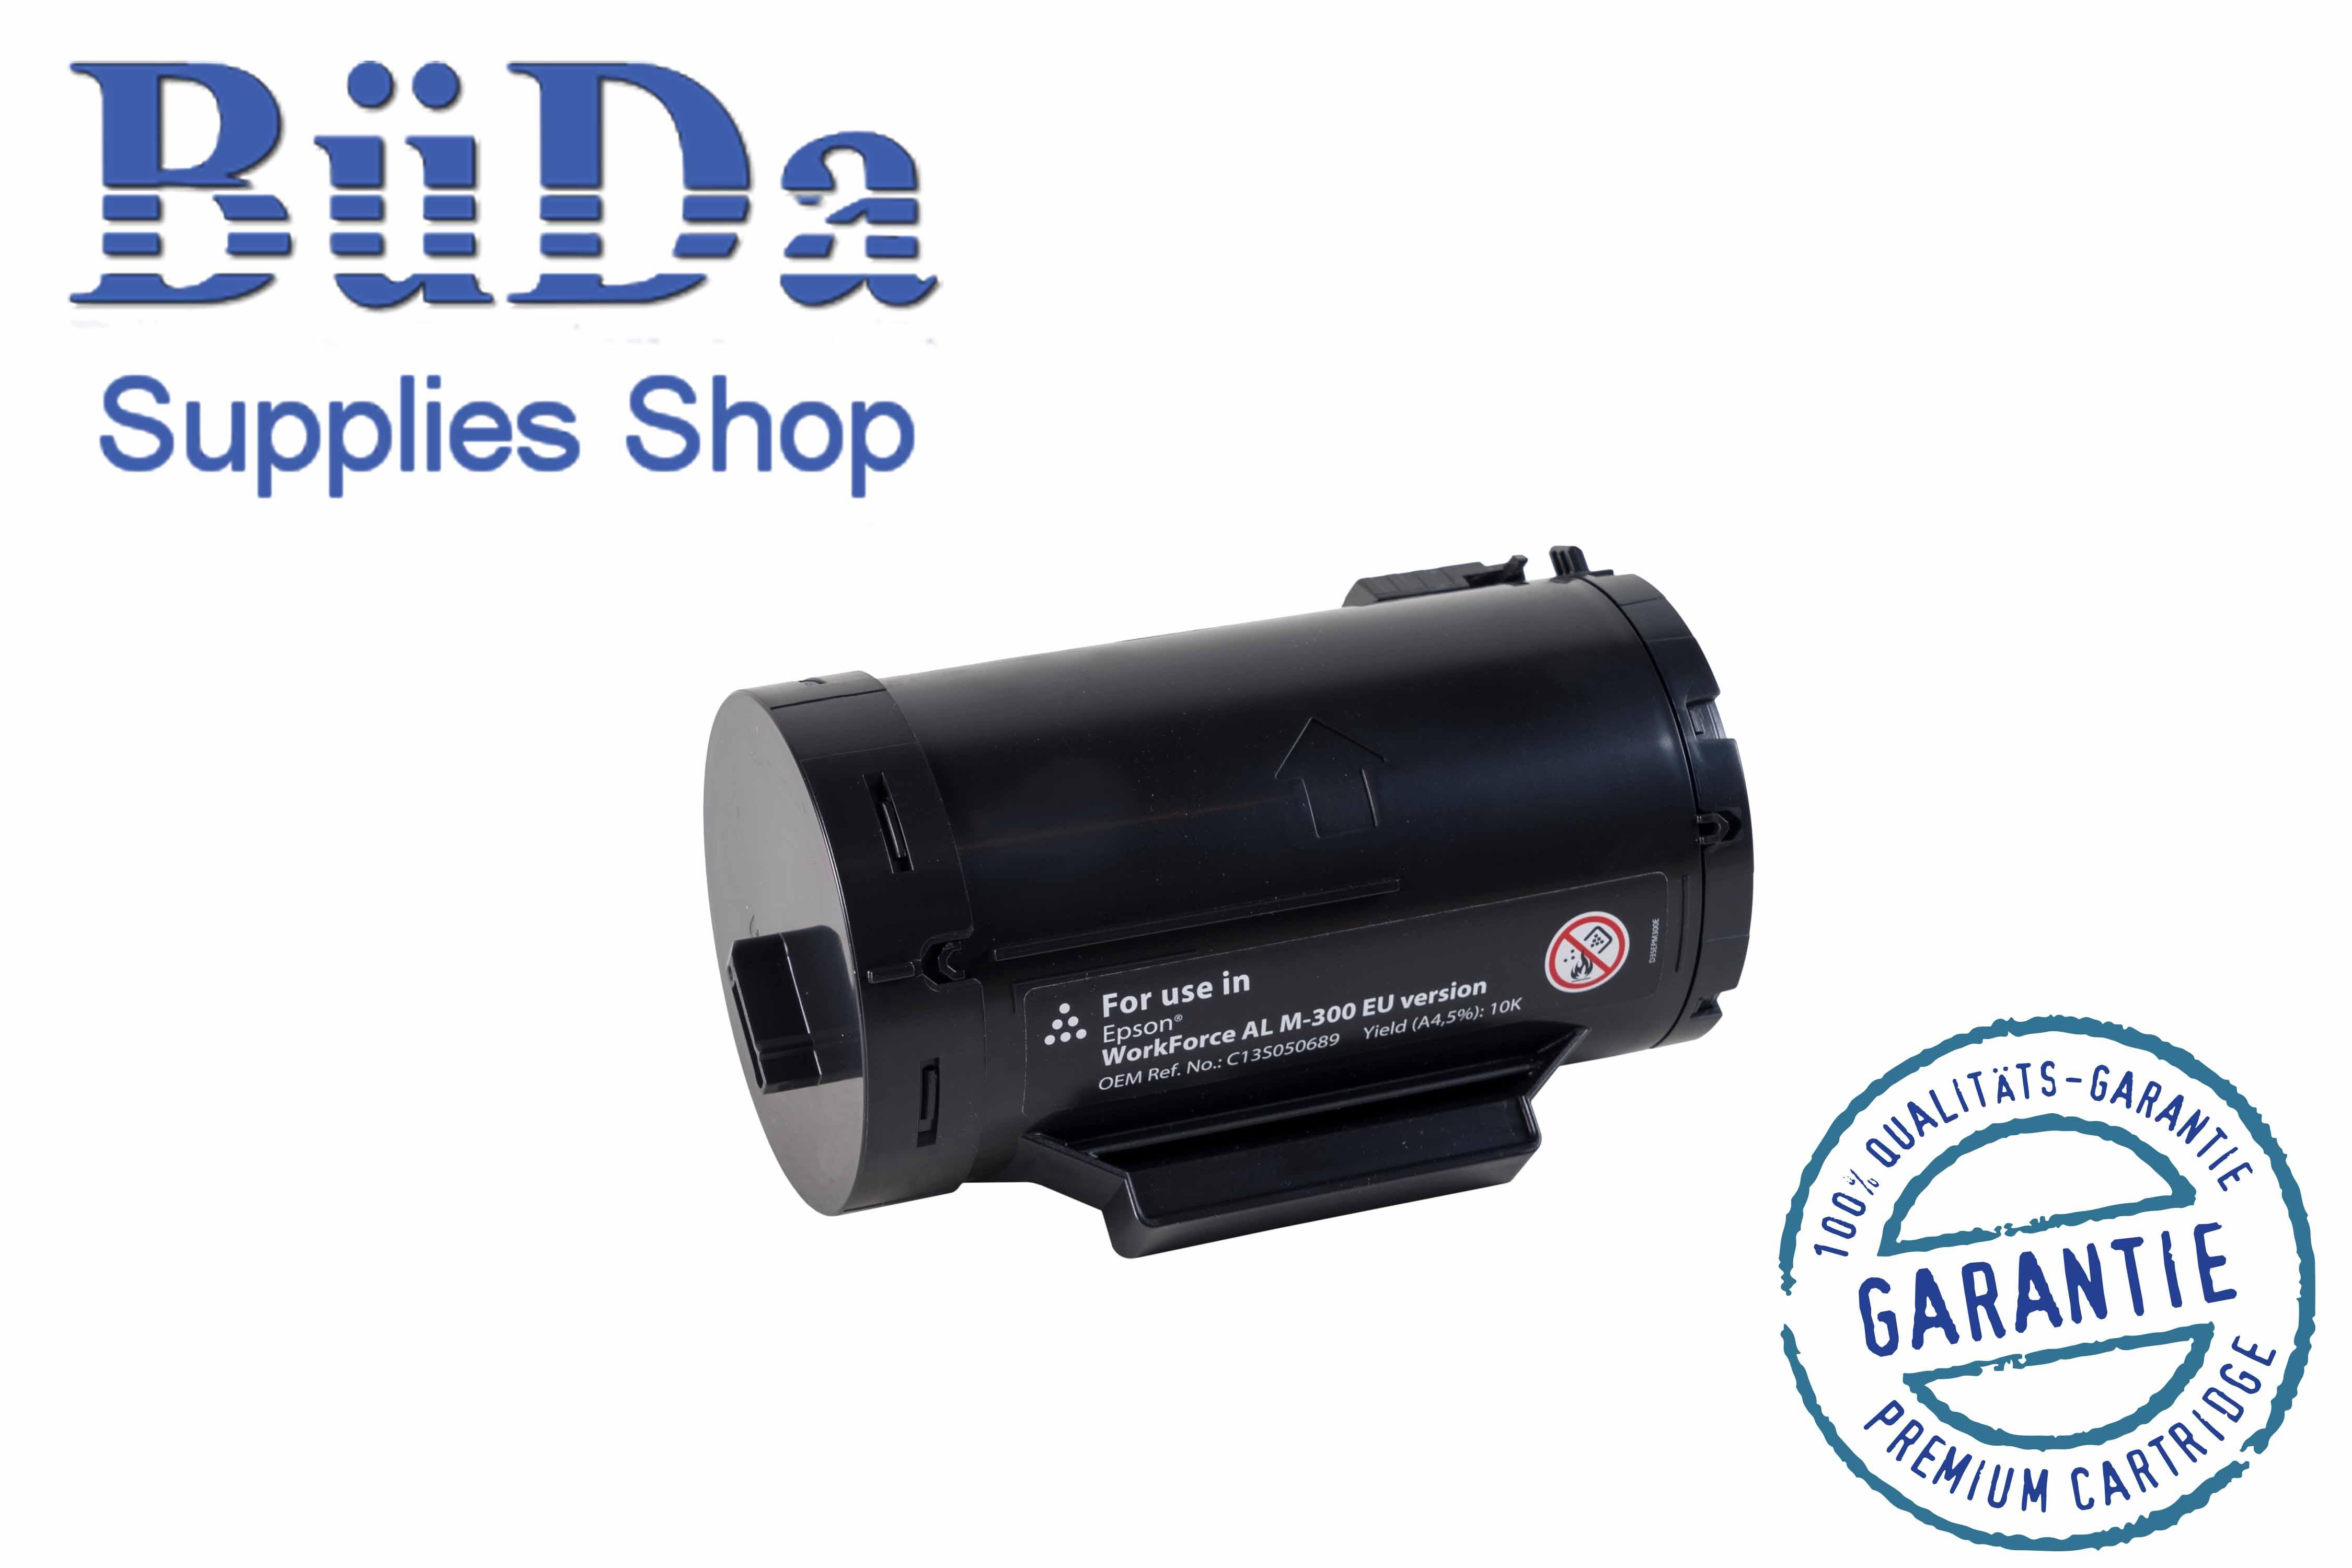 Toner-Modul komp. zu Epson AL-M300/MX300 black 10000 Seiten